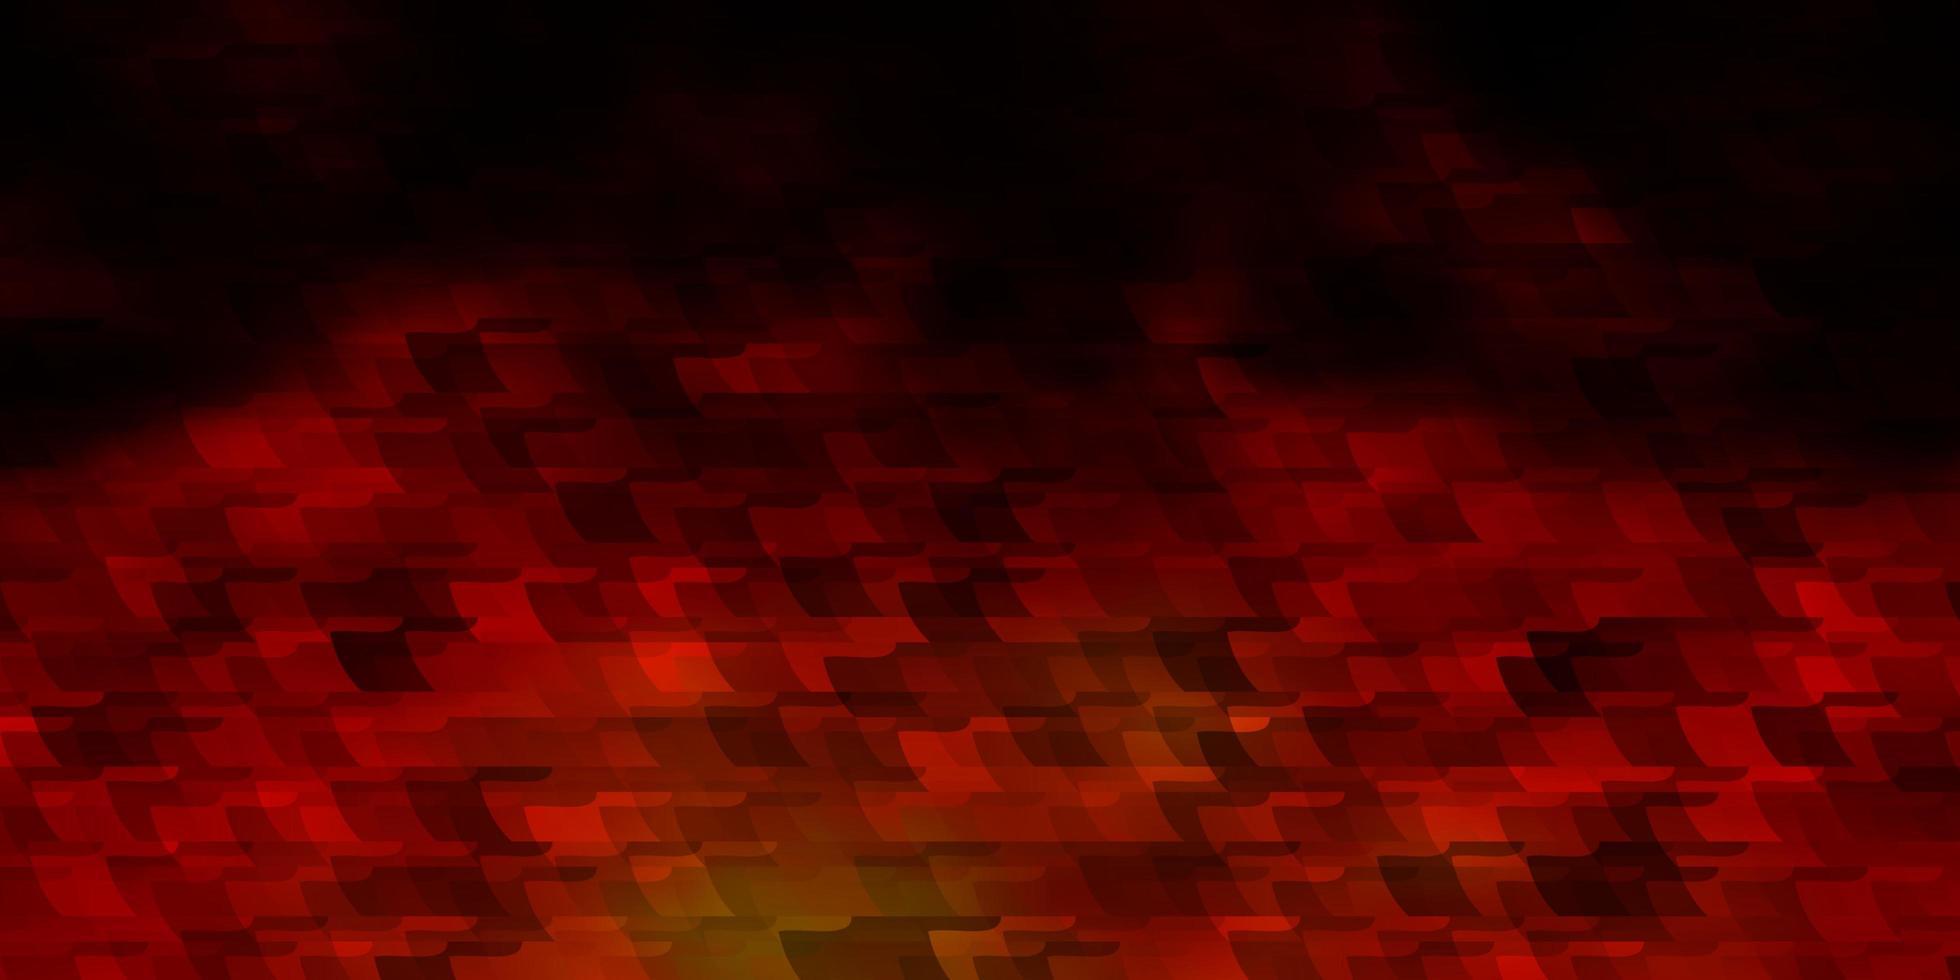 Telón de fondo de vector rojo oscuro con rectángulos.